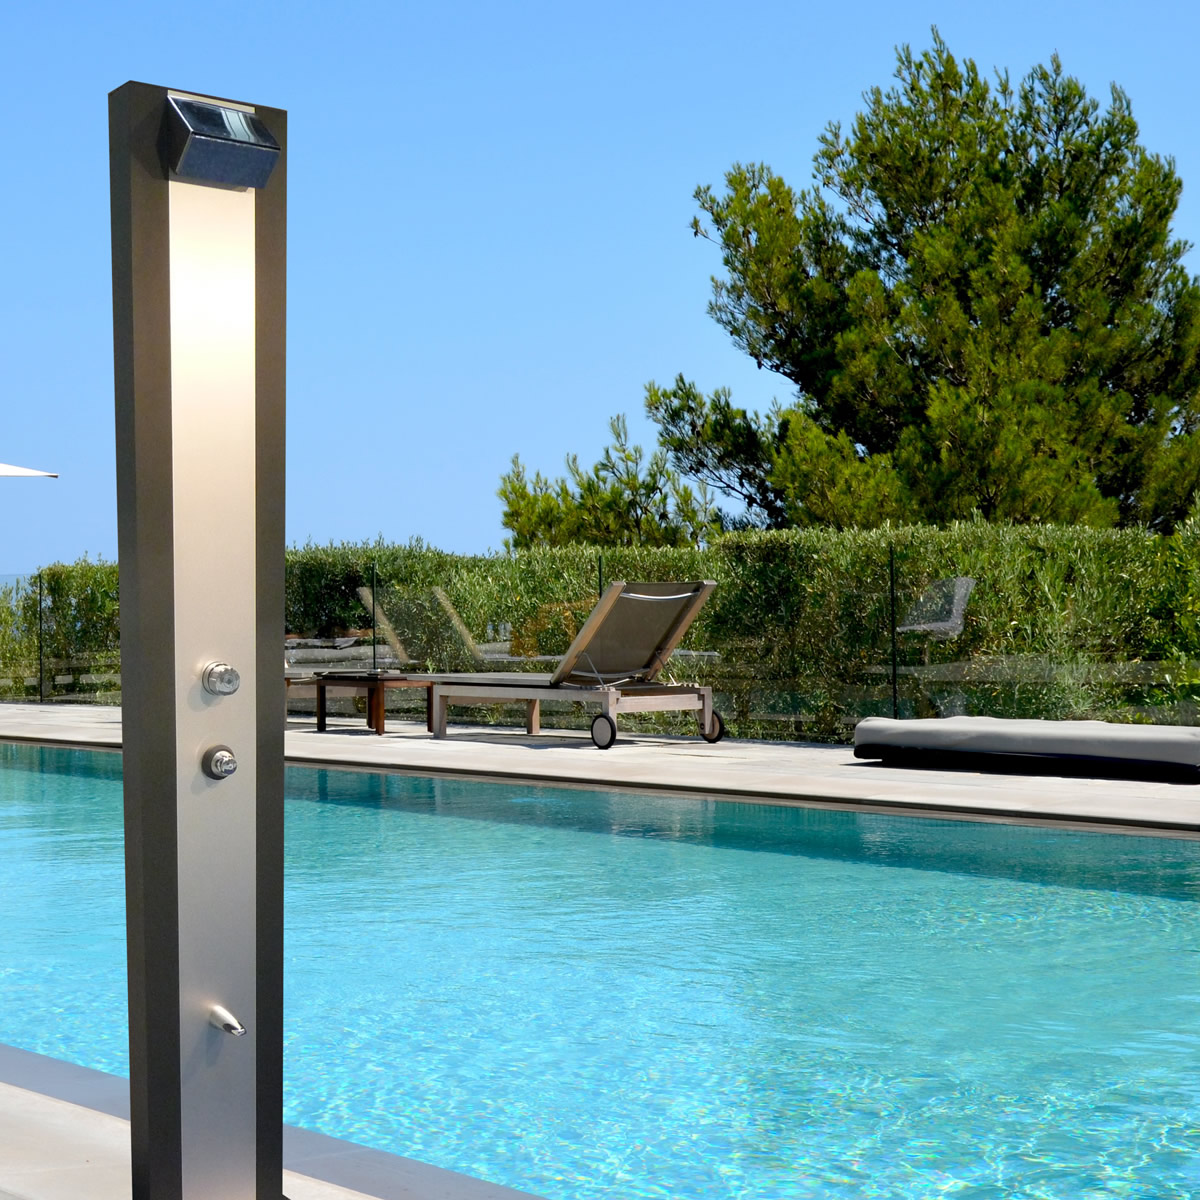 douche solaire axium aluminium toulouse. Black Bedroom Furniture Sets. Home Design Ideas